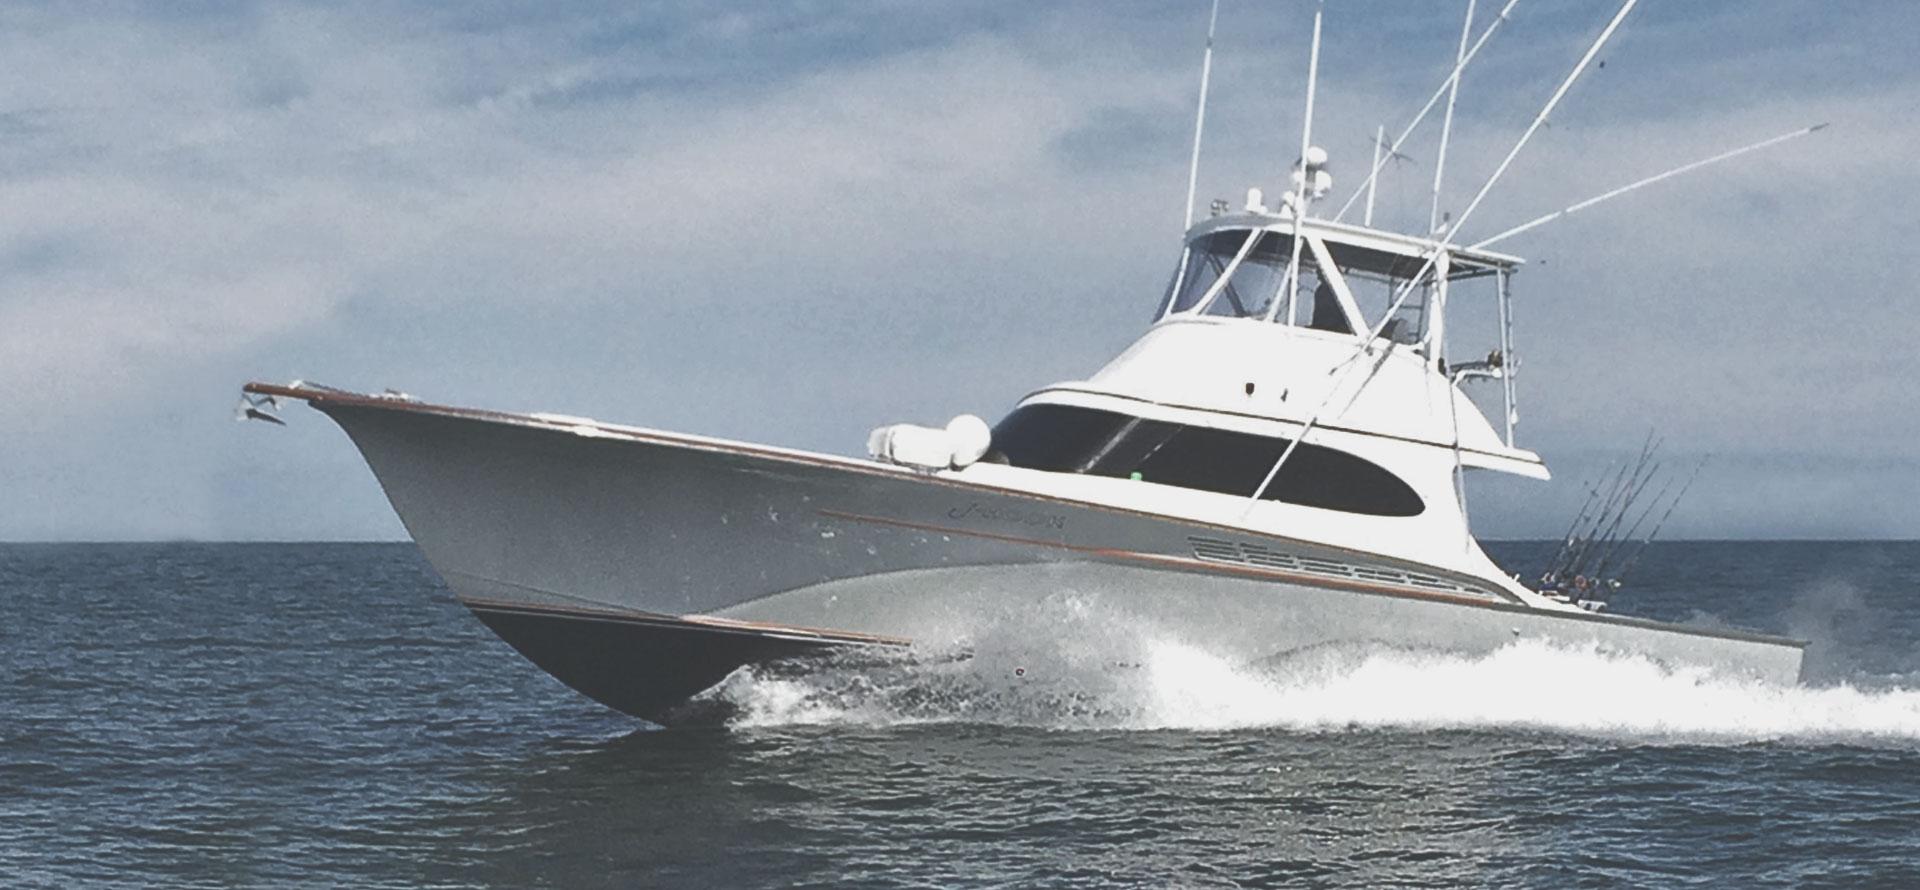 j-hook-fishing-charters-st-augustine-florida-best-sportfishing-boat-profile